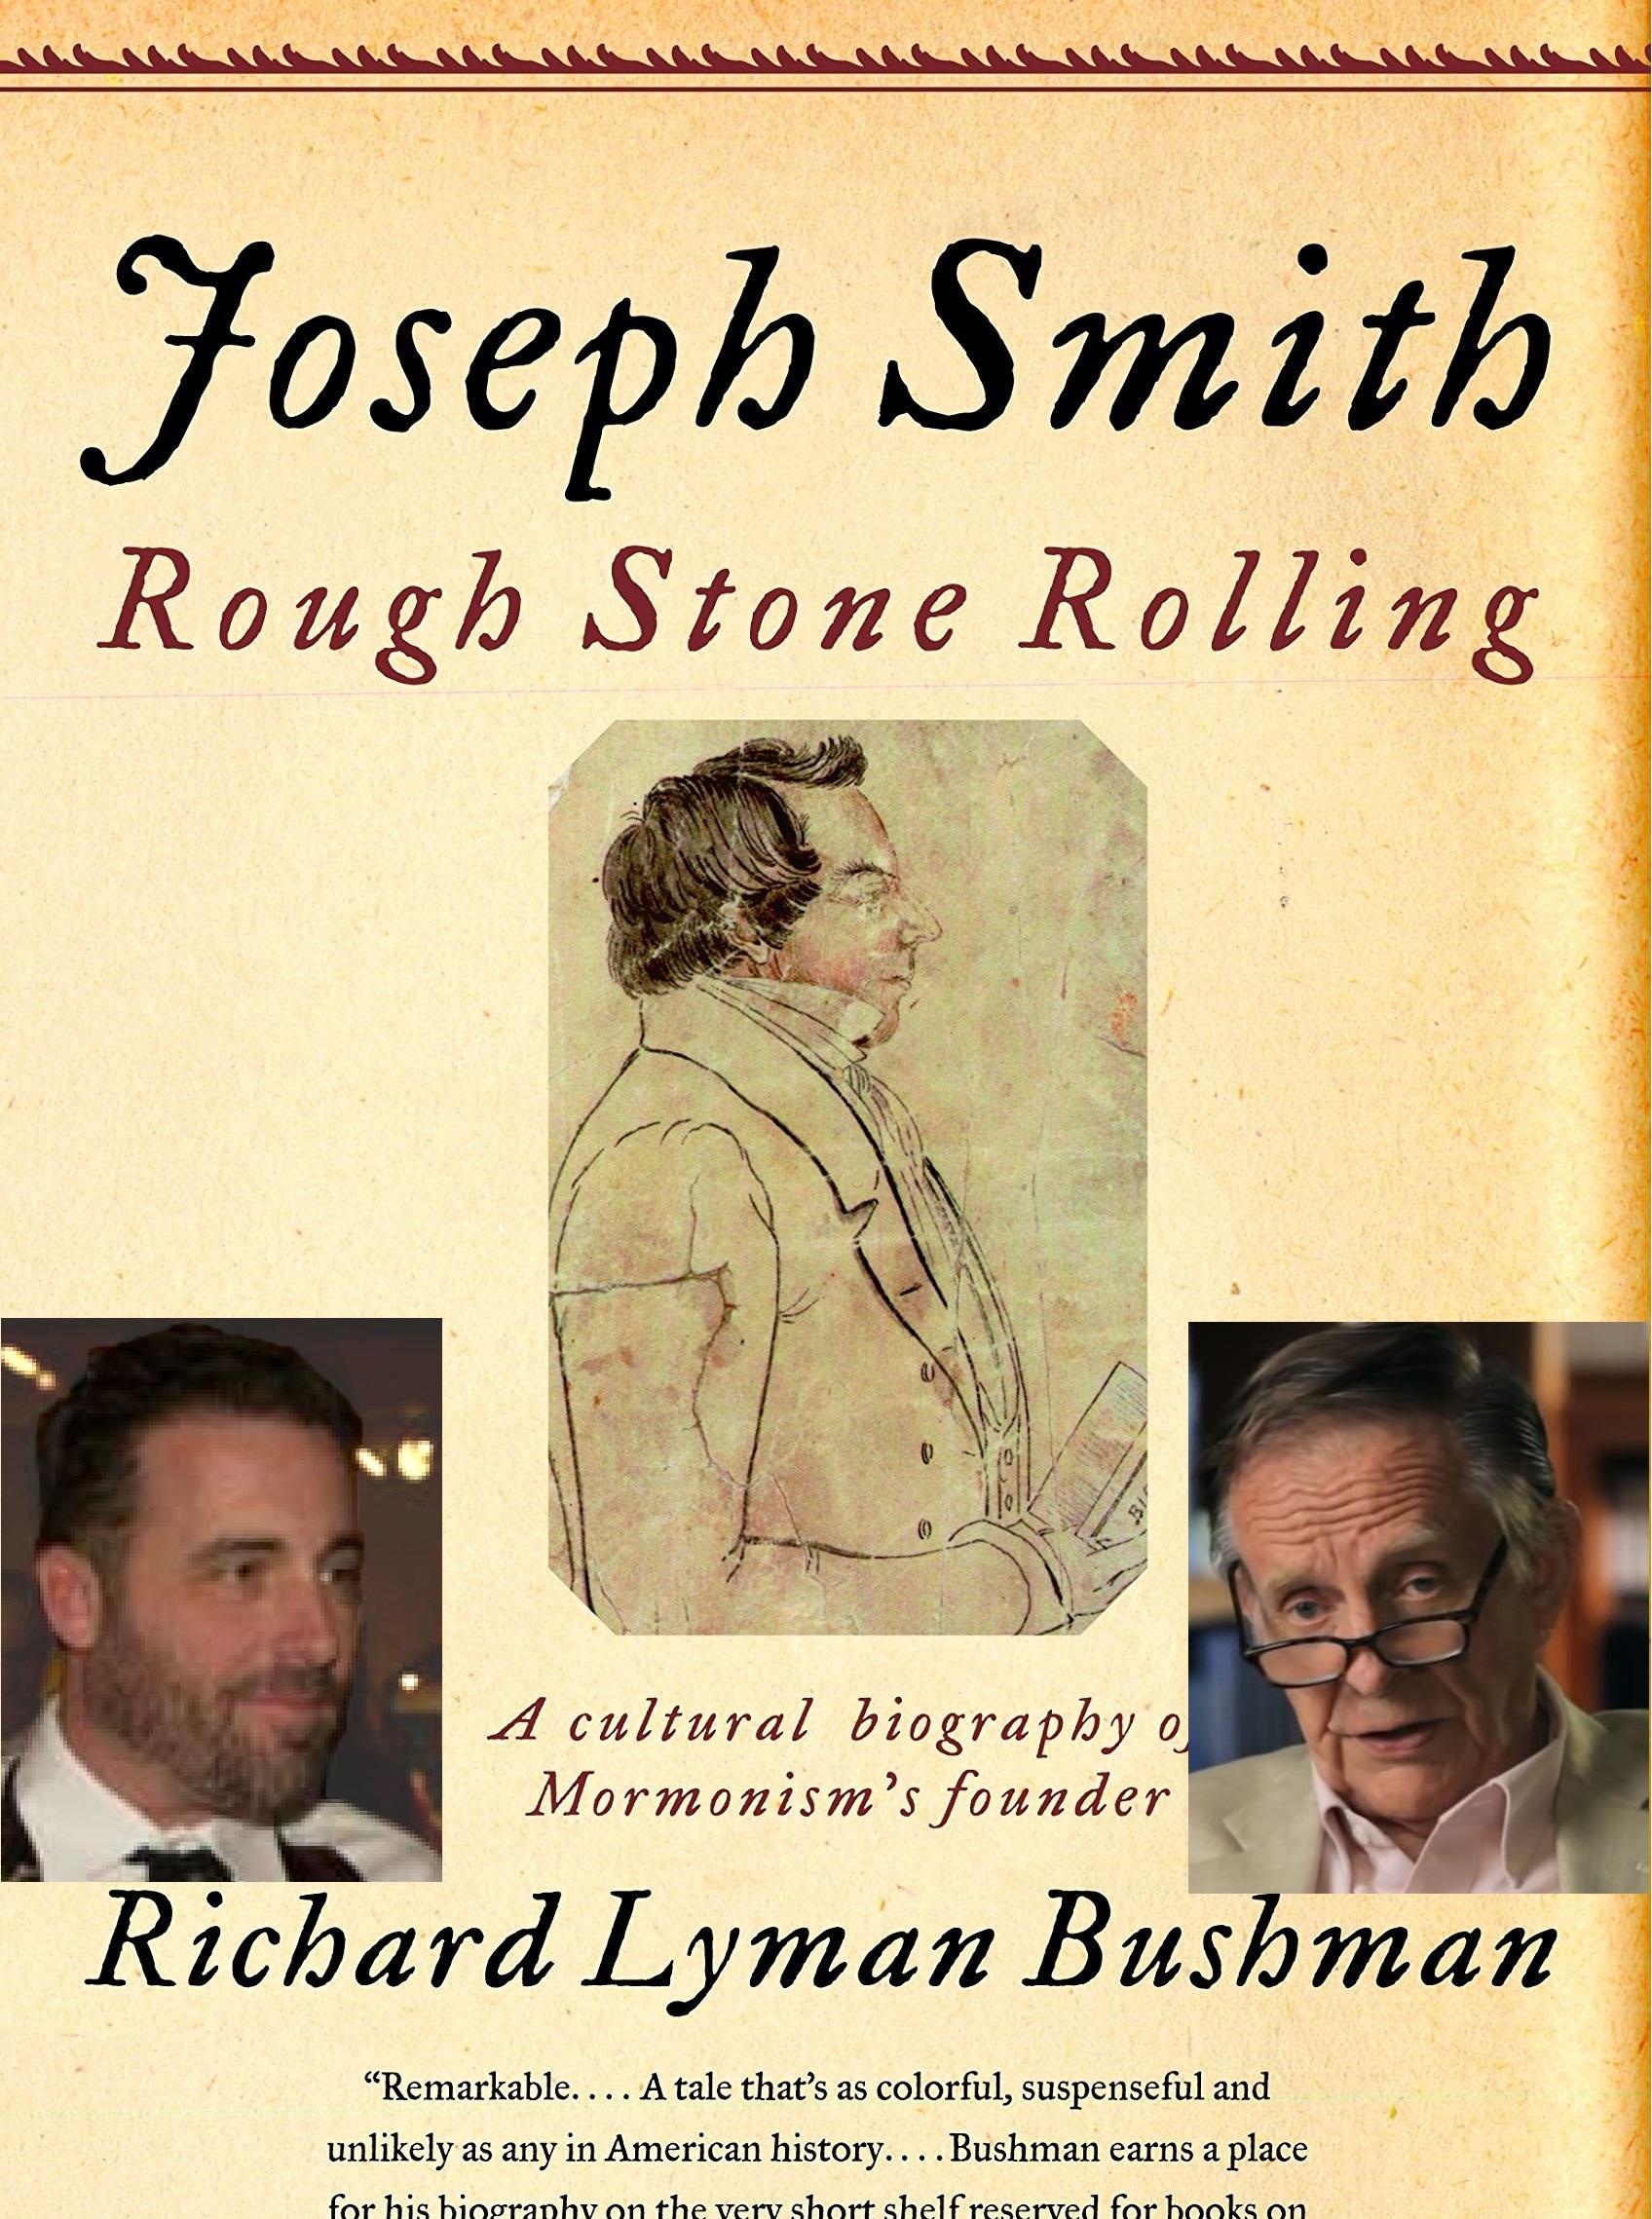 Interview with Richard Lyman Bushman about Joseph Smith: Rough Stone Rolling